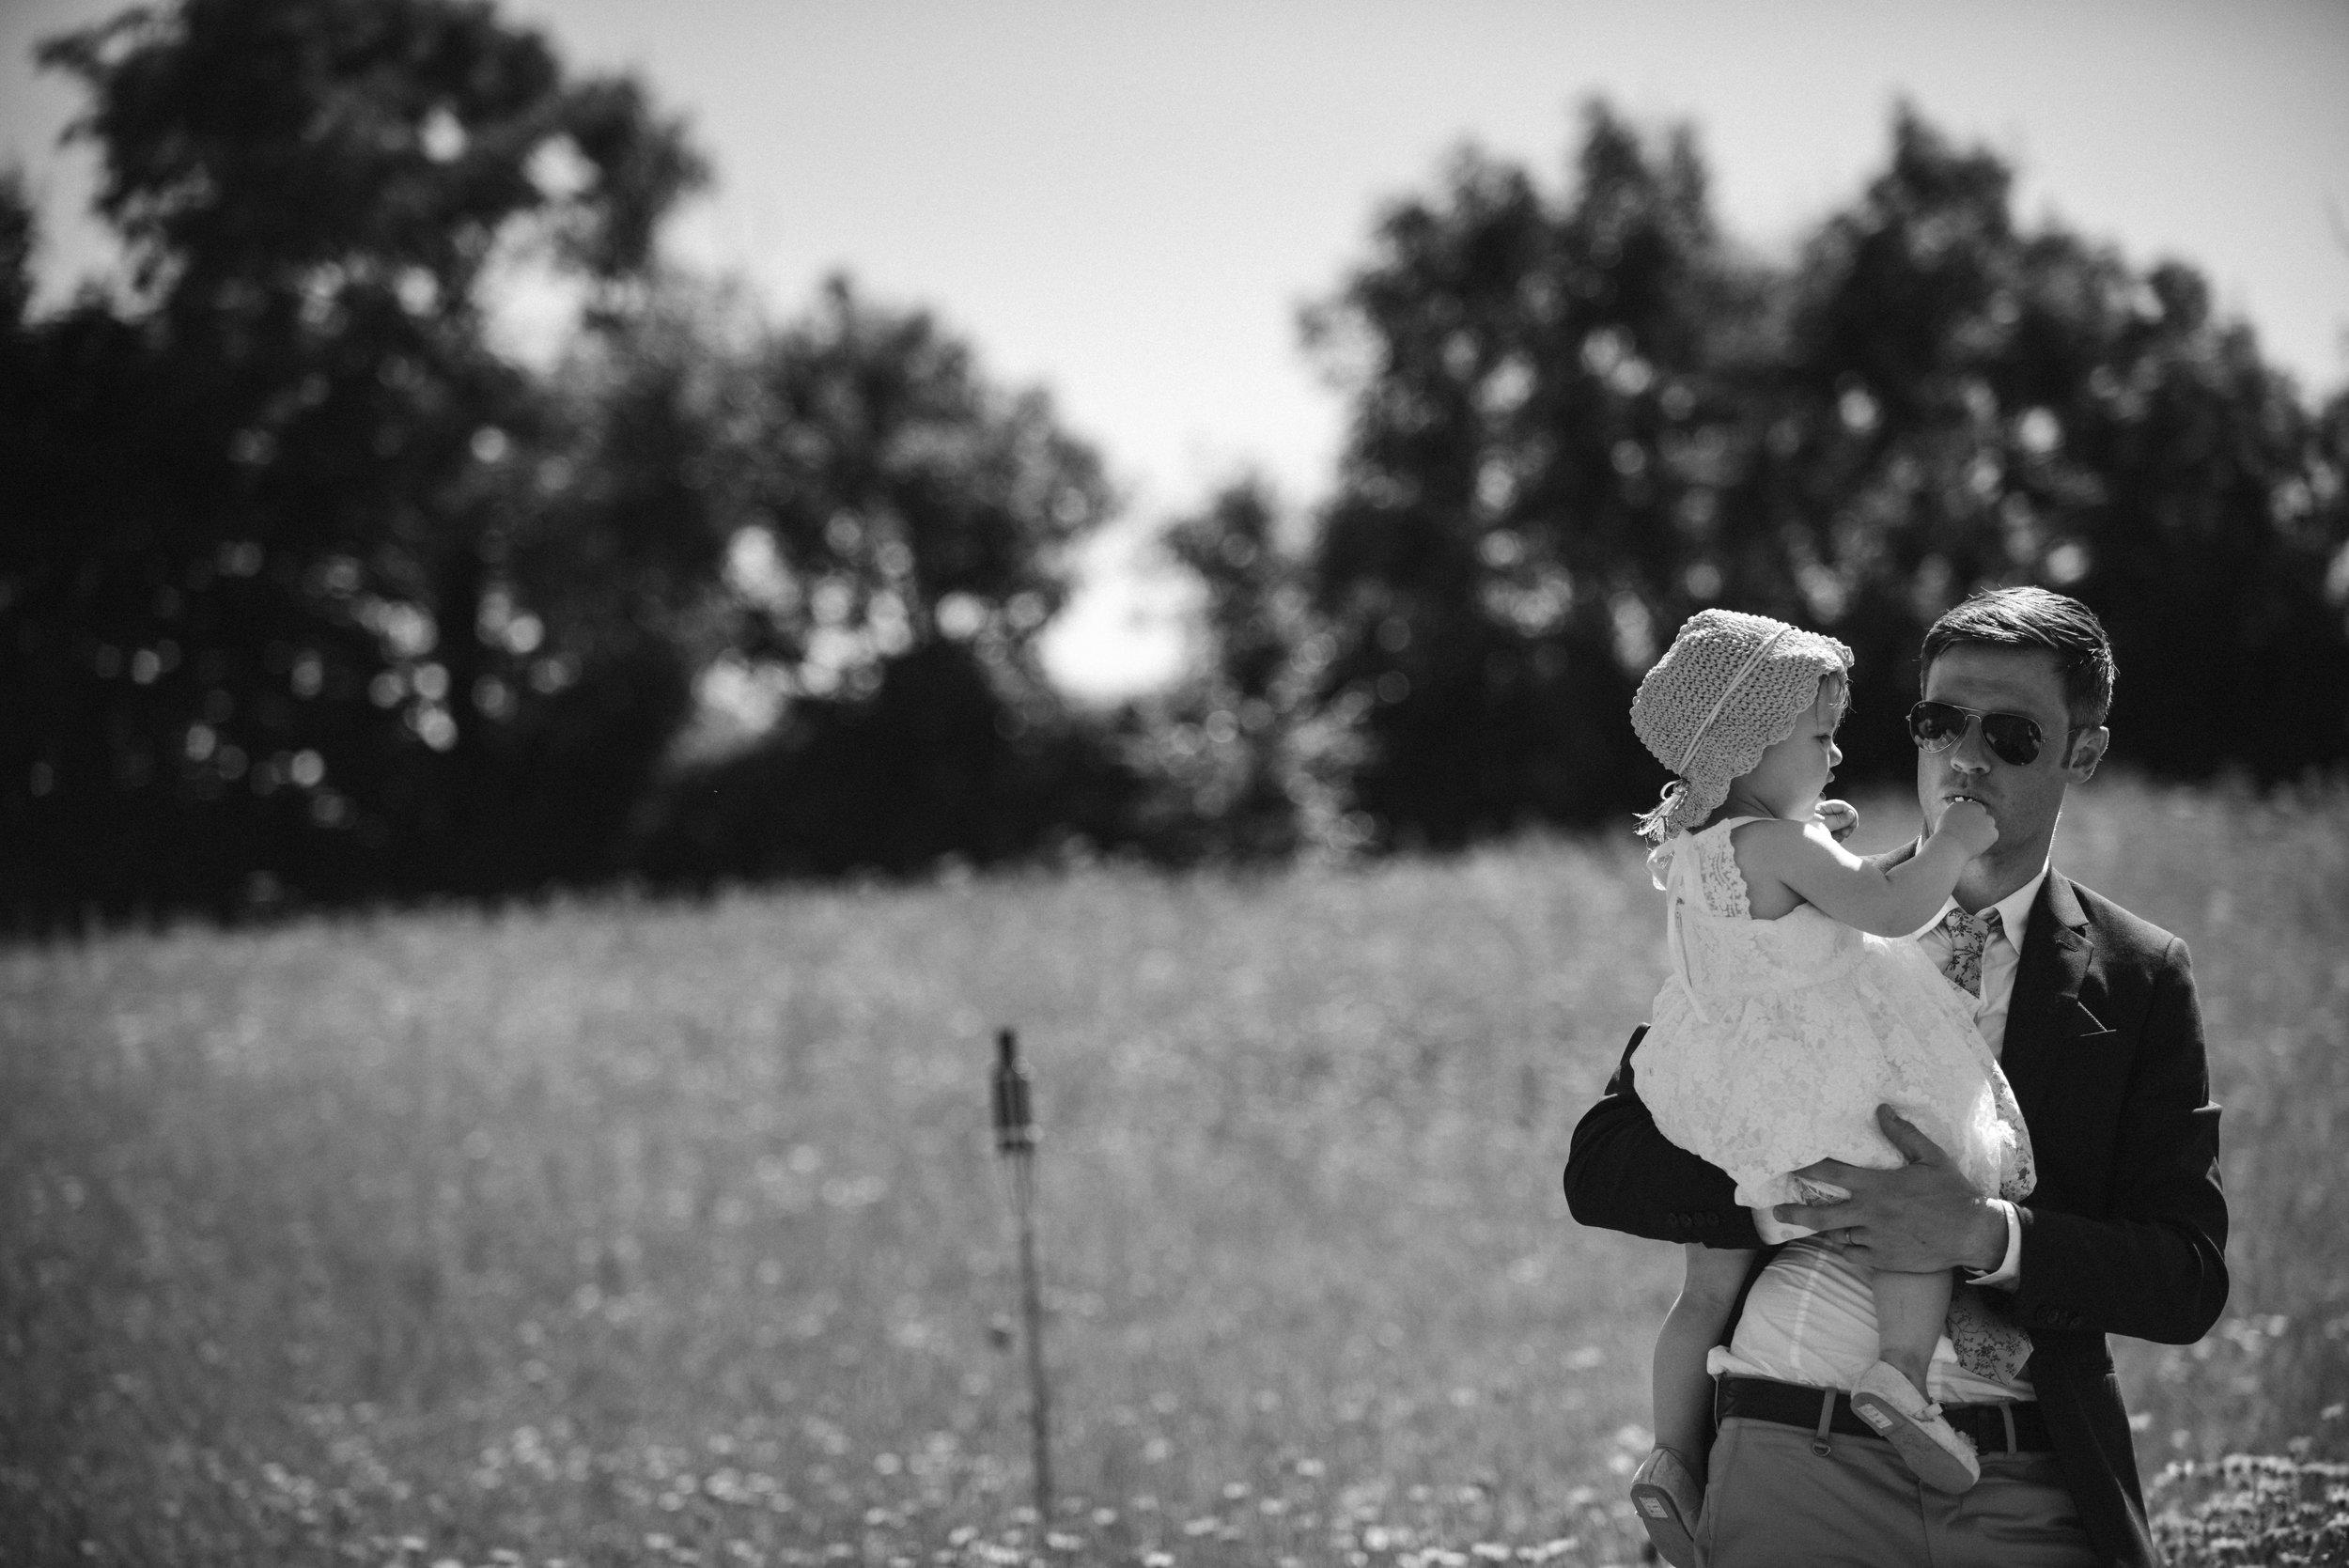 ash-barton-estate-wedding-photographer-mark-shaw-25.jpg